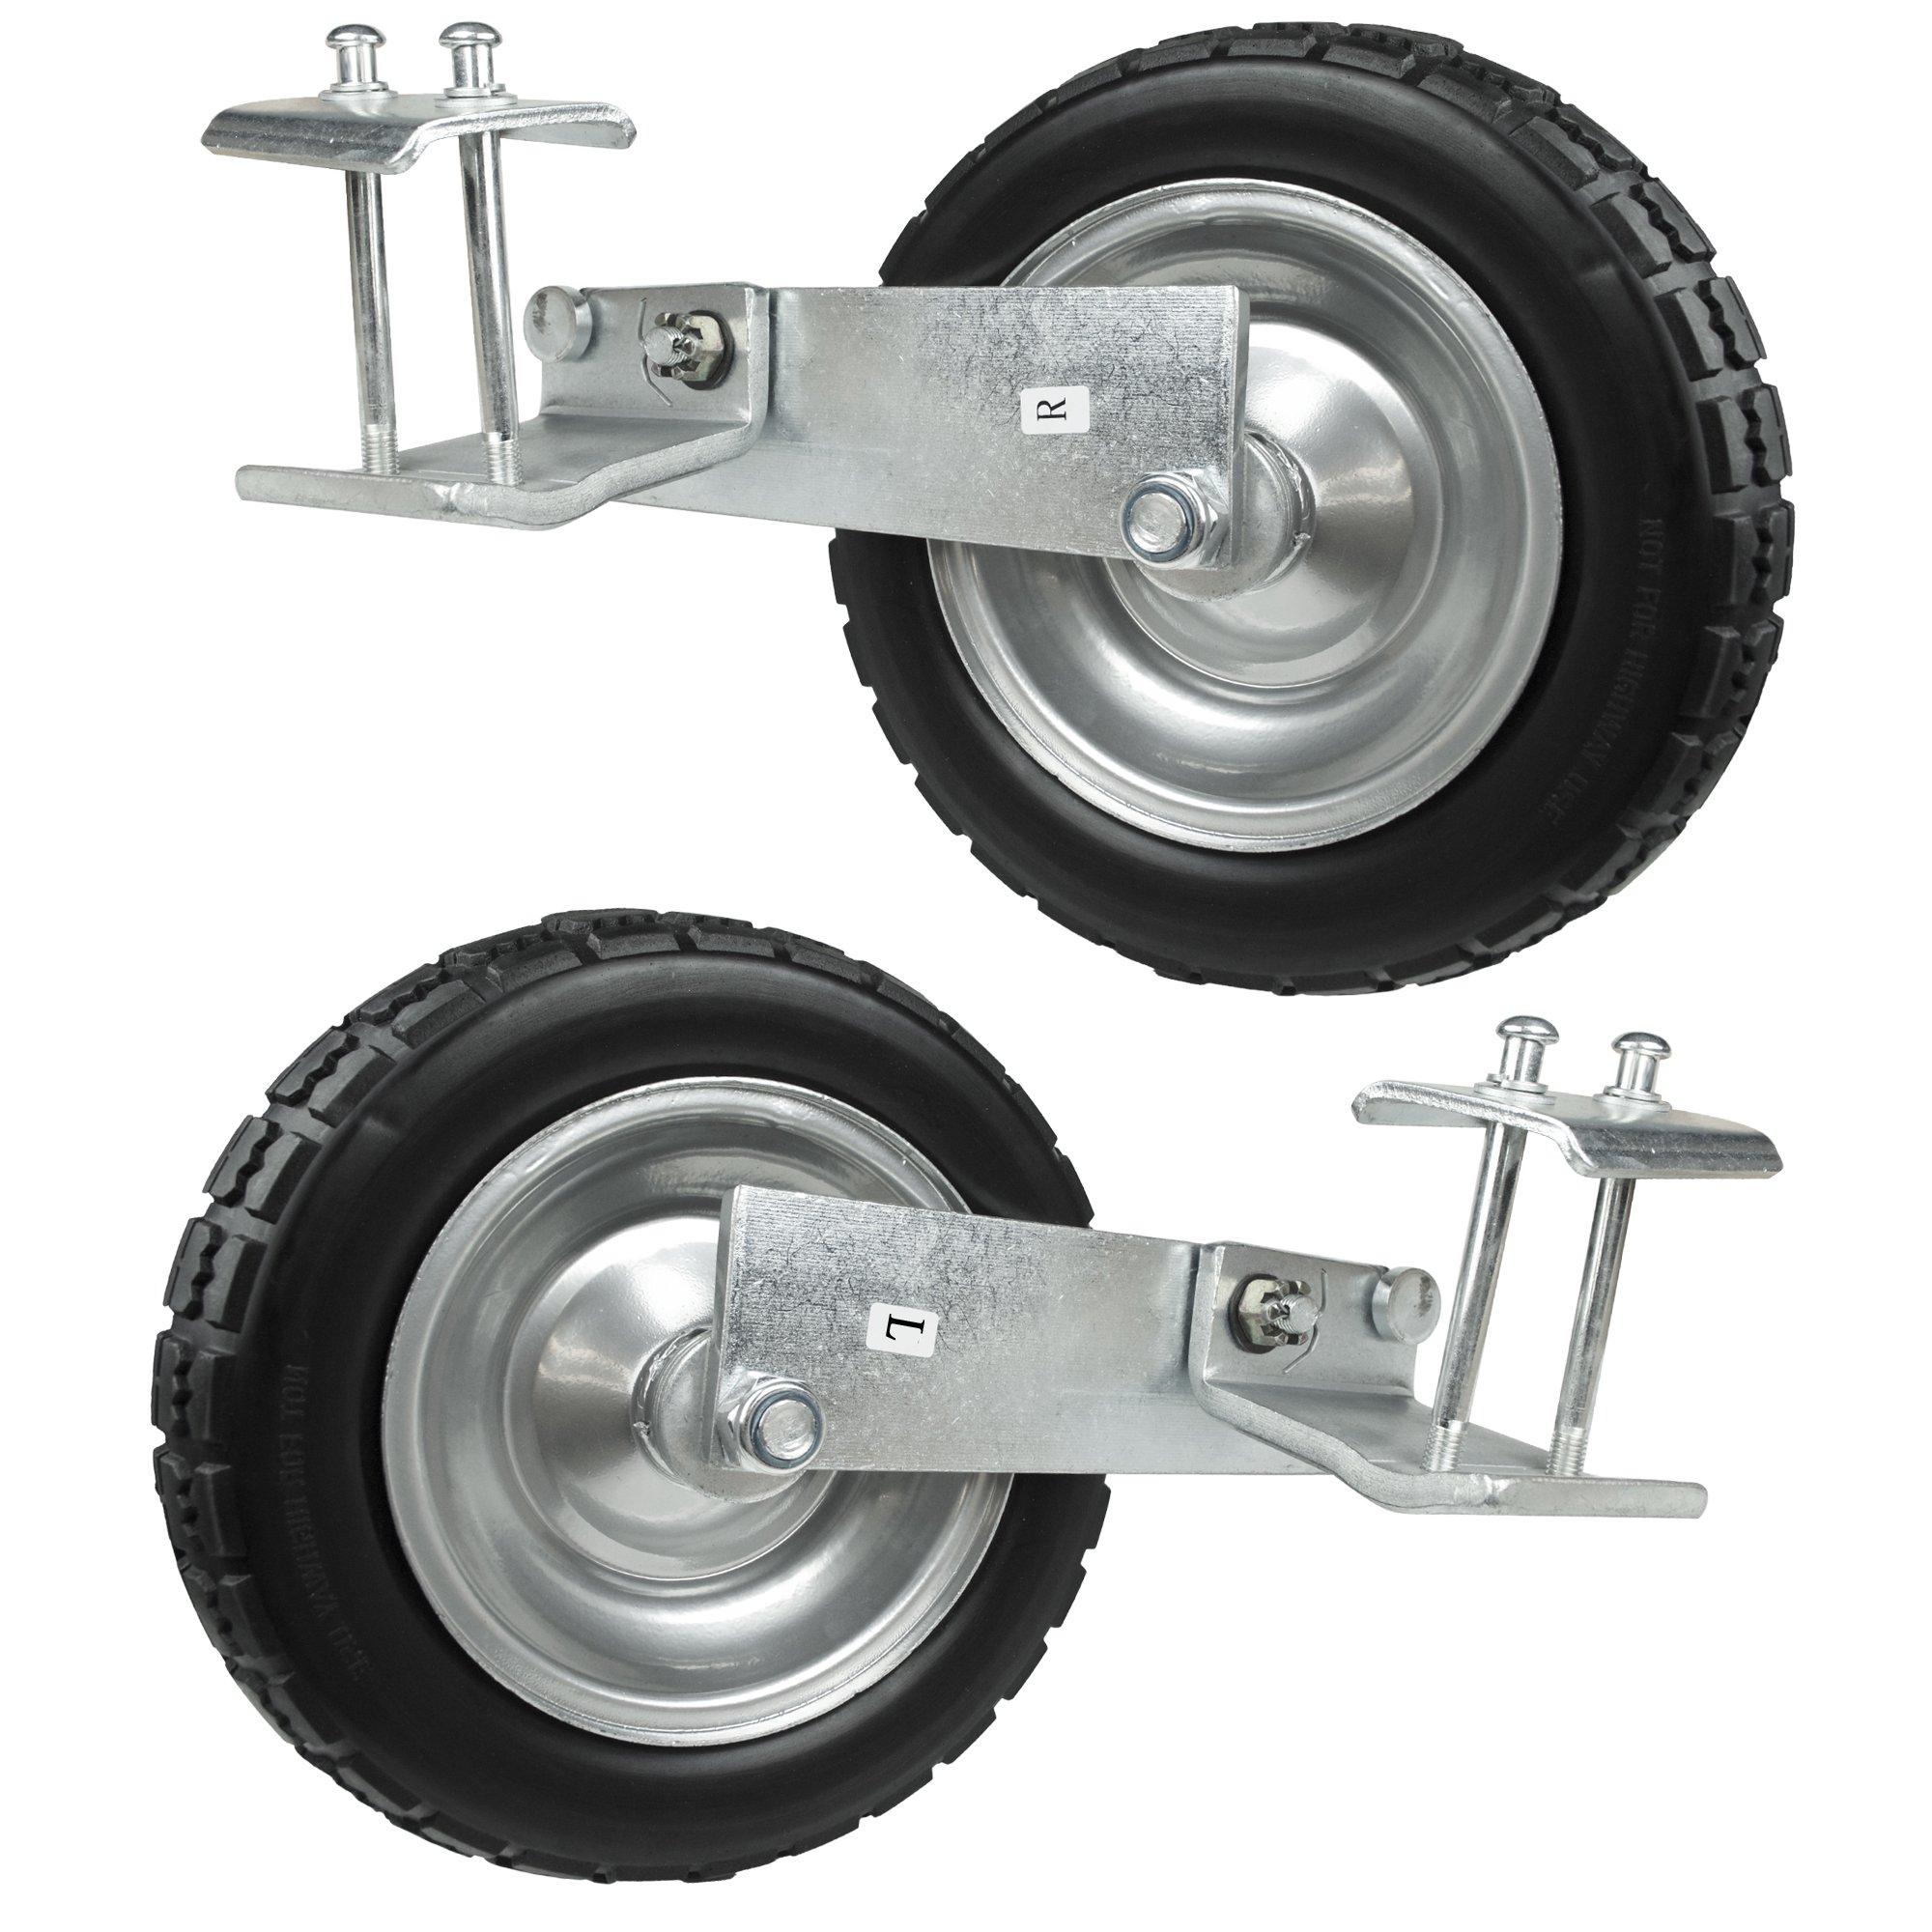 PU Tire Wheels for AGORA Premier Pro Soccer Goals - Set of 2